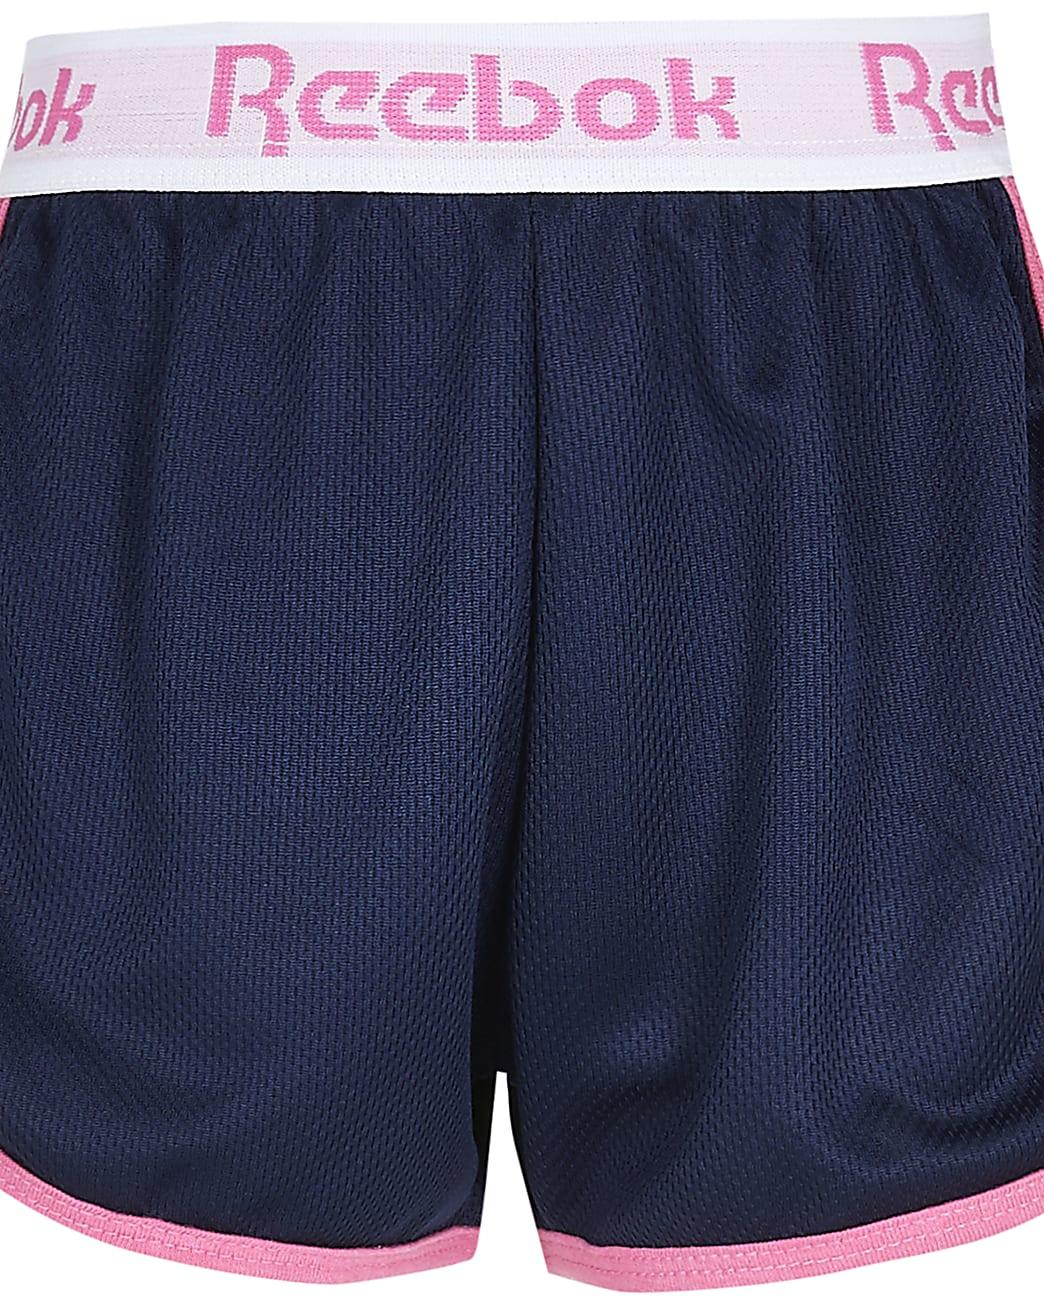 Age 13+ girls blue Reebok shorts